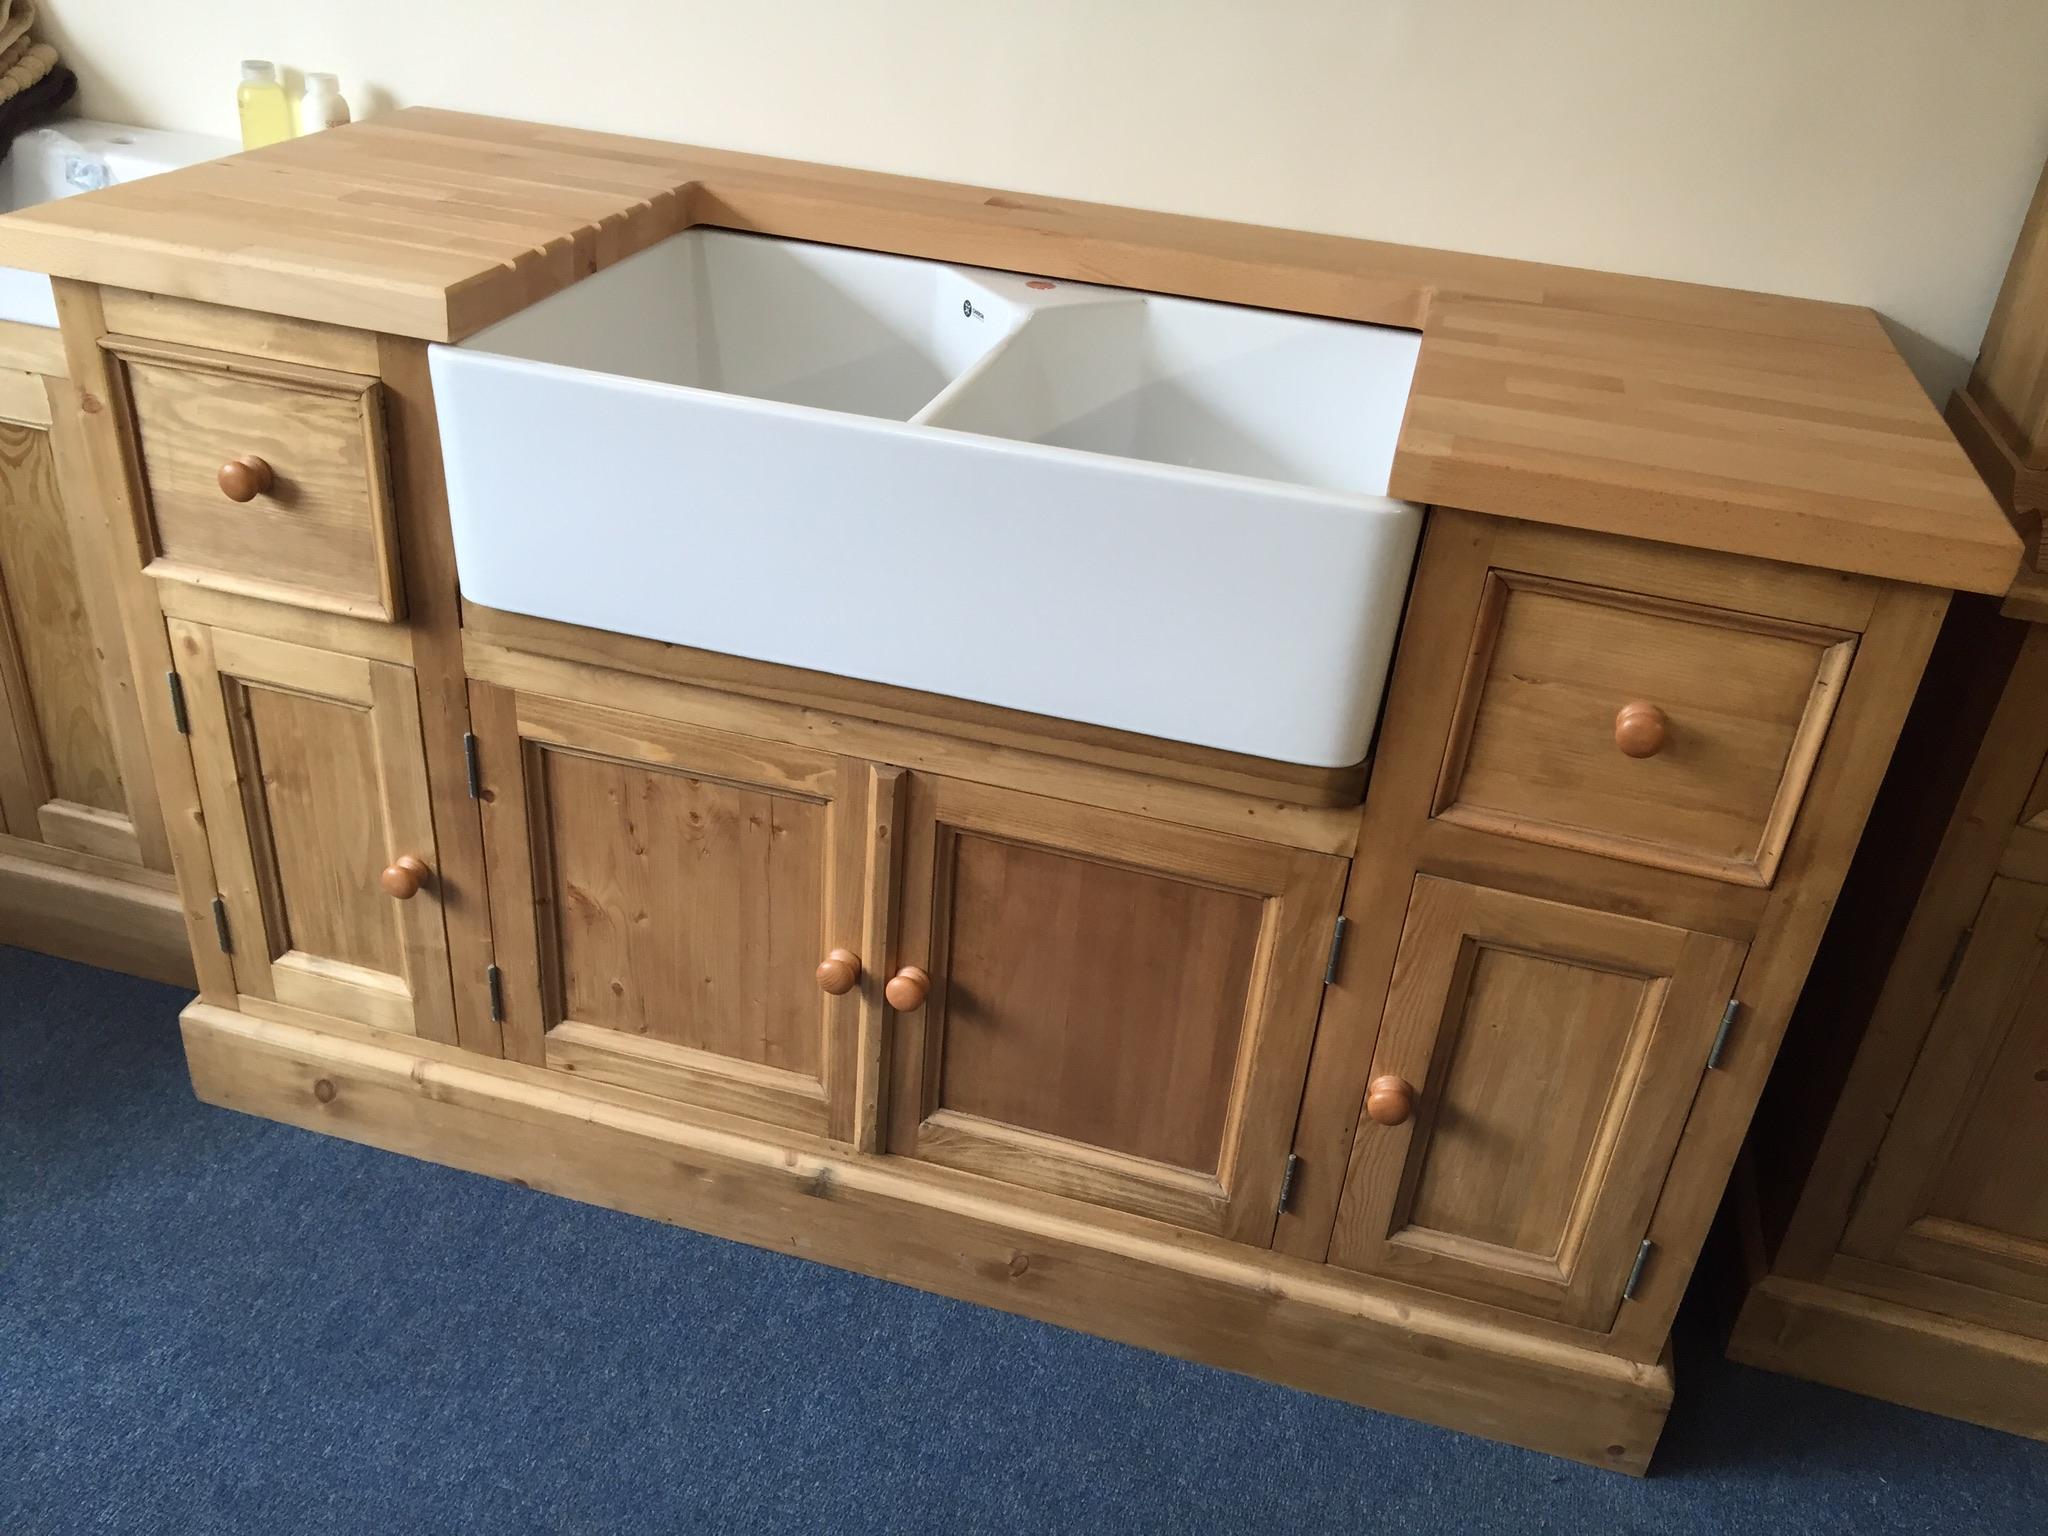 Freestanding Kitchen Sink Unit Winkleigh Timber Devon Quality Hand Crafted Wood